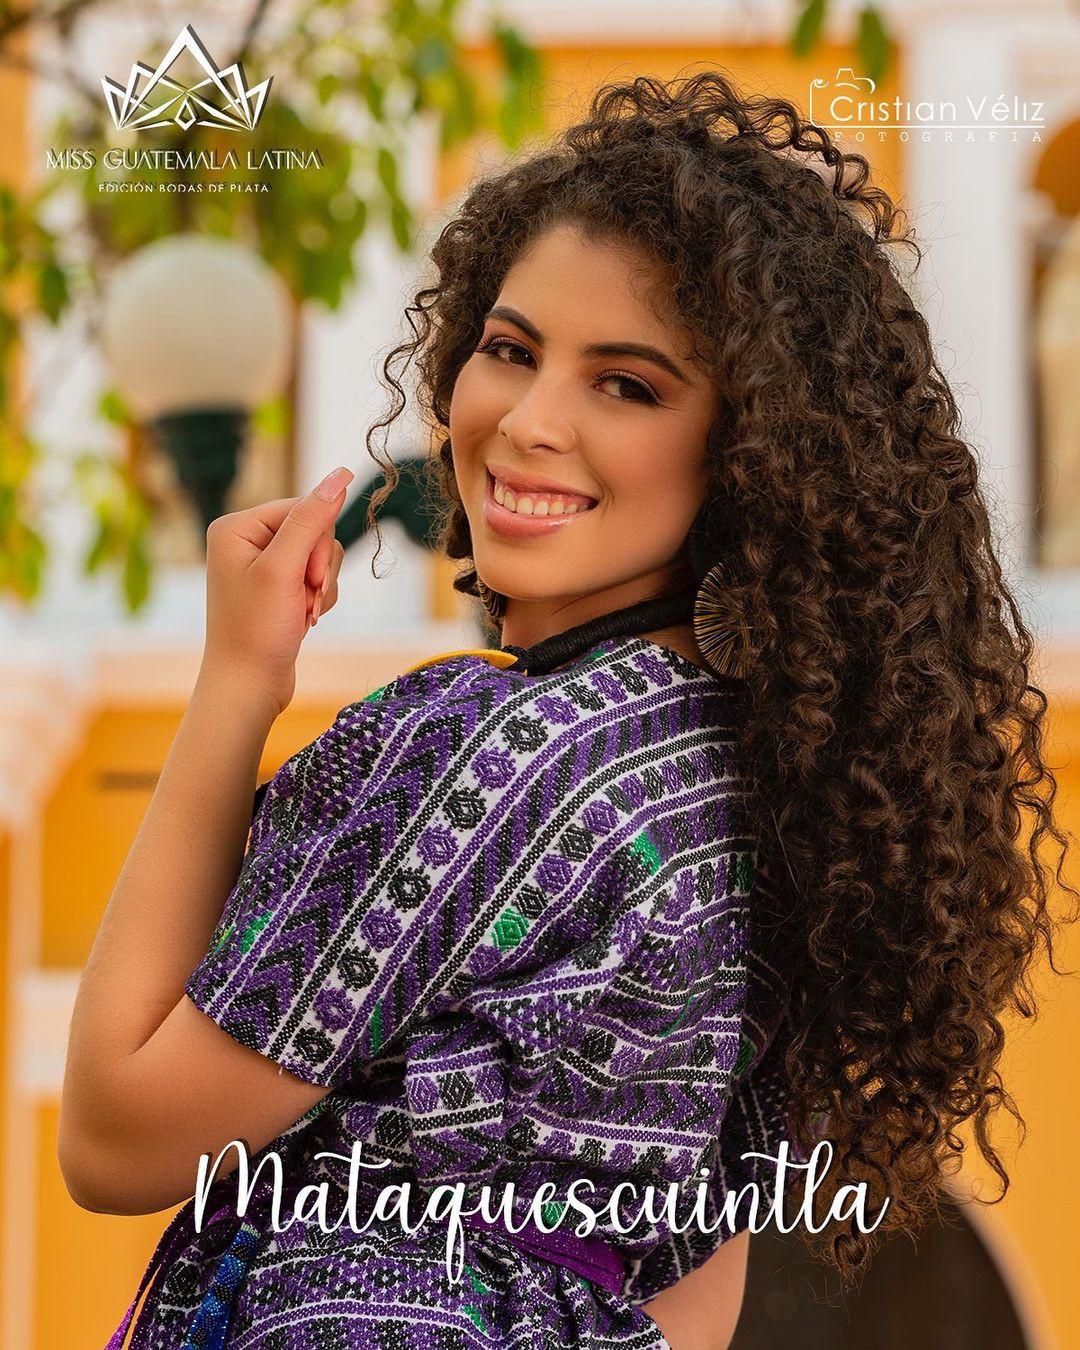 candidatas a miss guatemala latina 2021. final: 30 de abril. - Página 2 B2gkBa